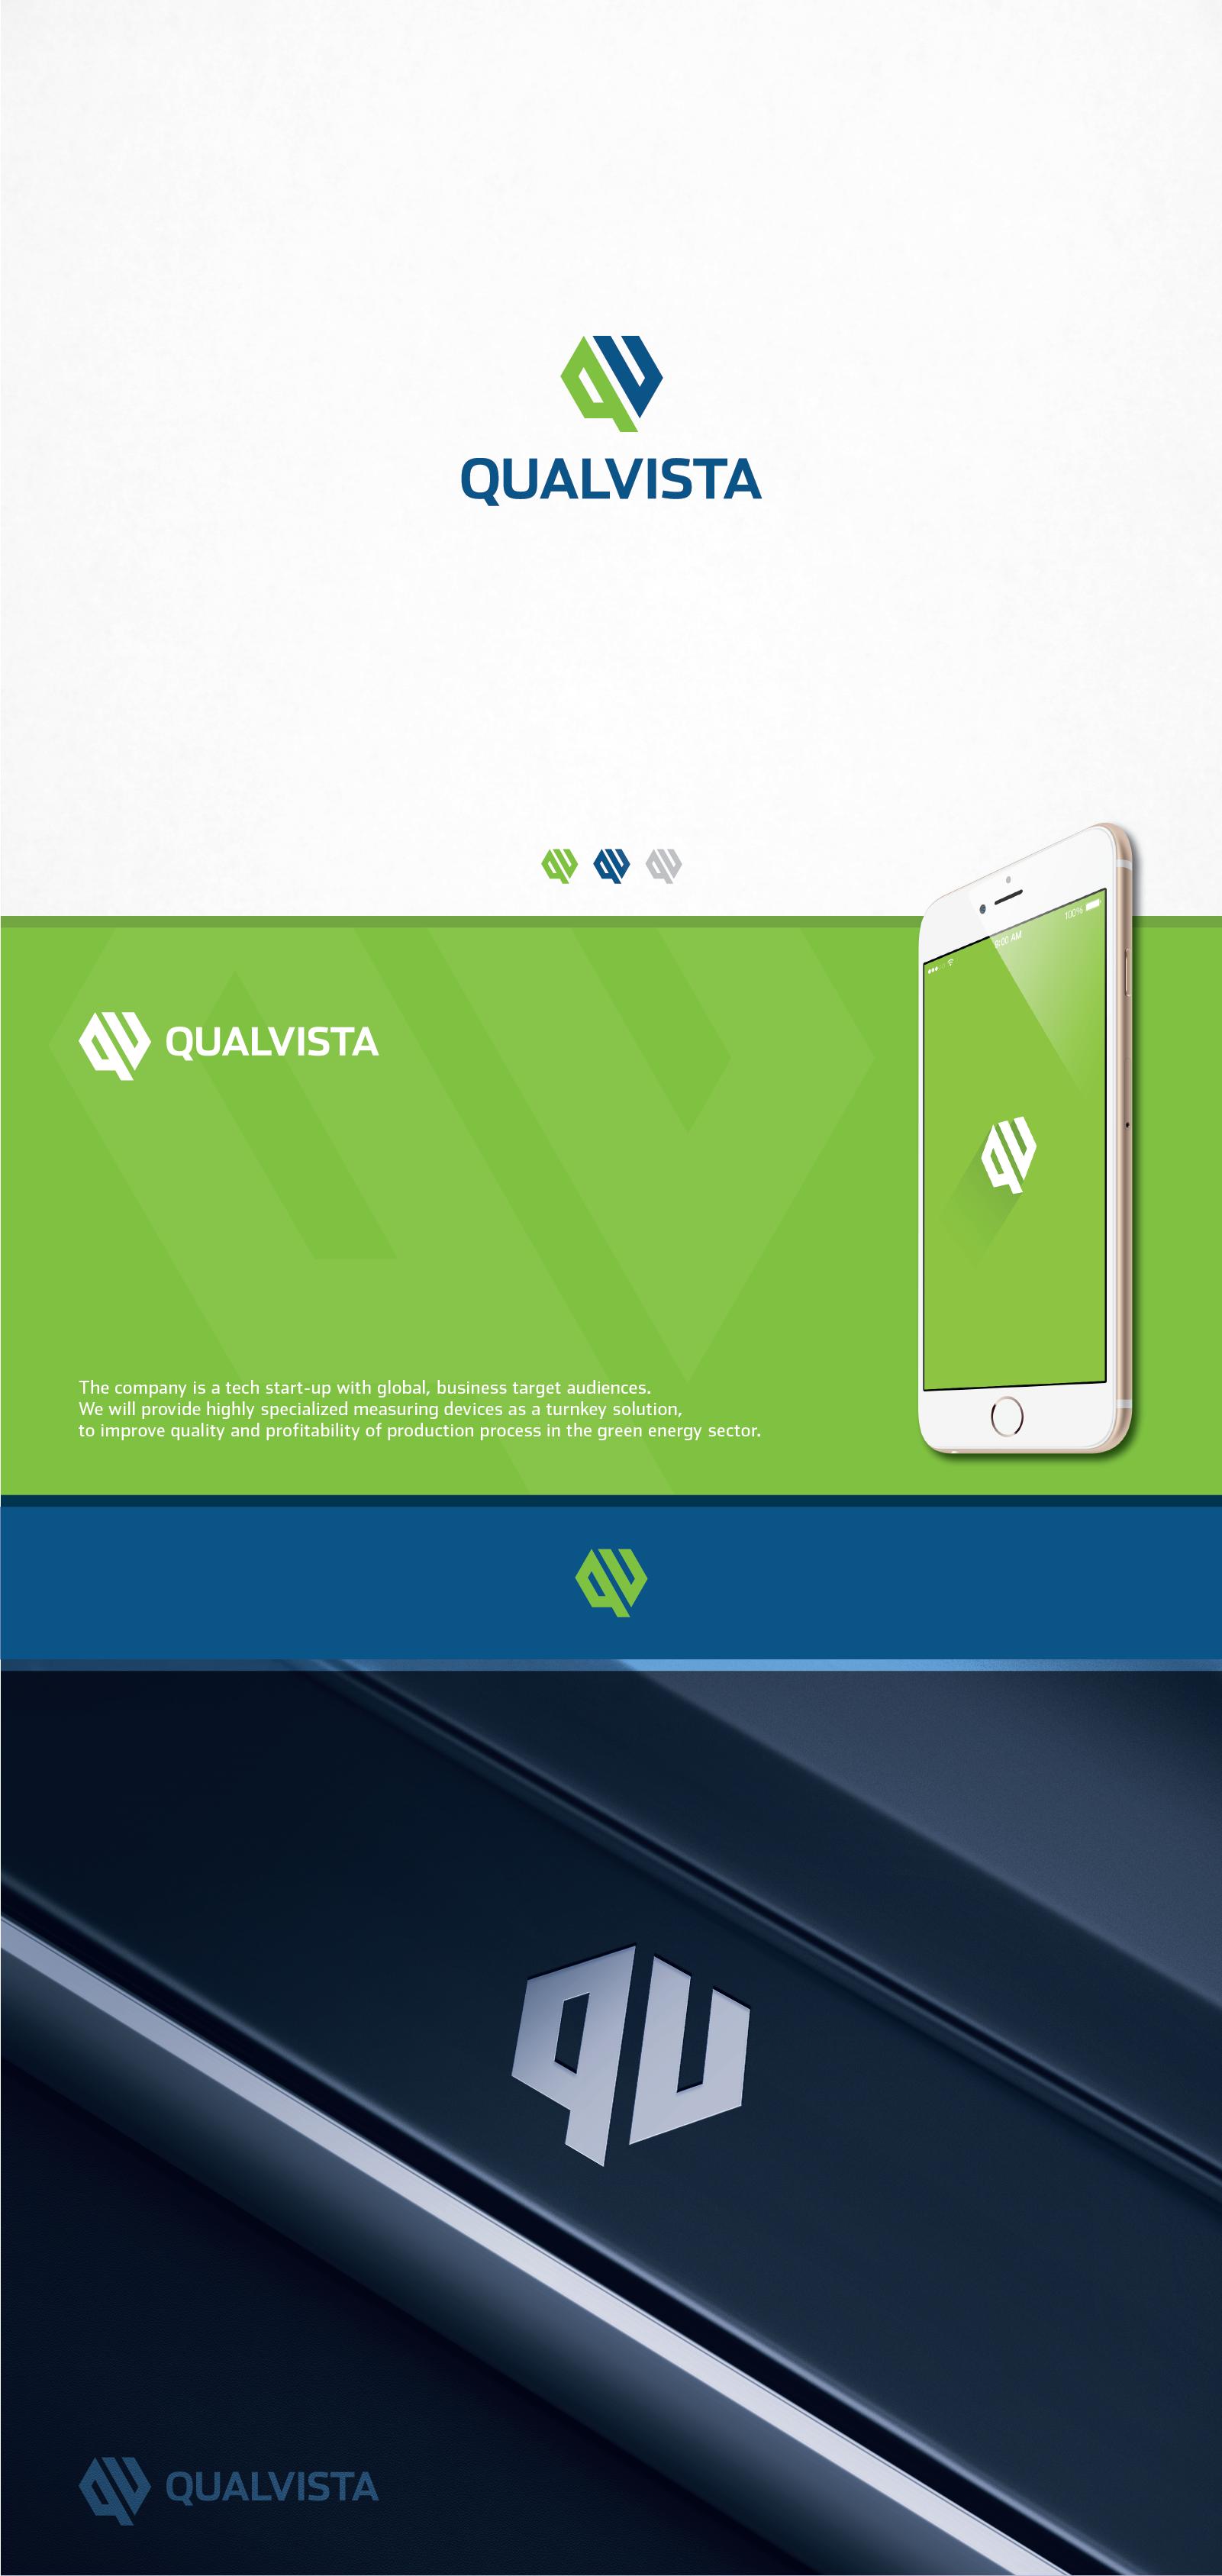 Create a stylish logo for a green tech start-up